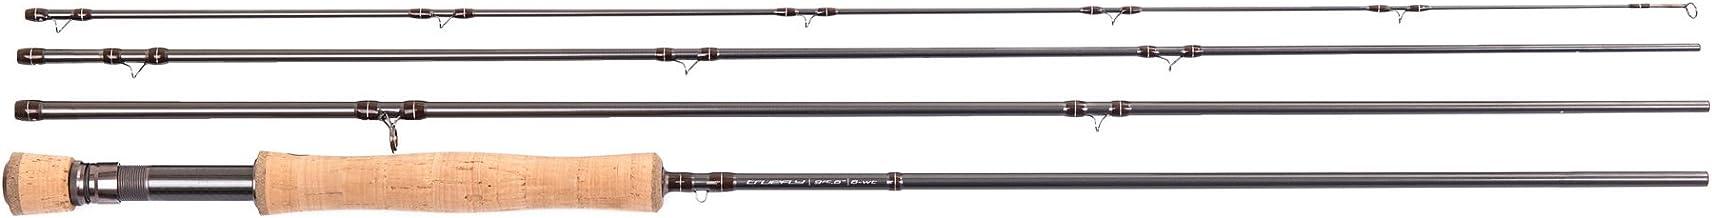 wychwood aura fly rod 9ft 6 inch#7 4p//c rod